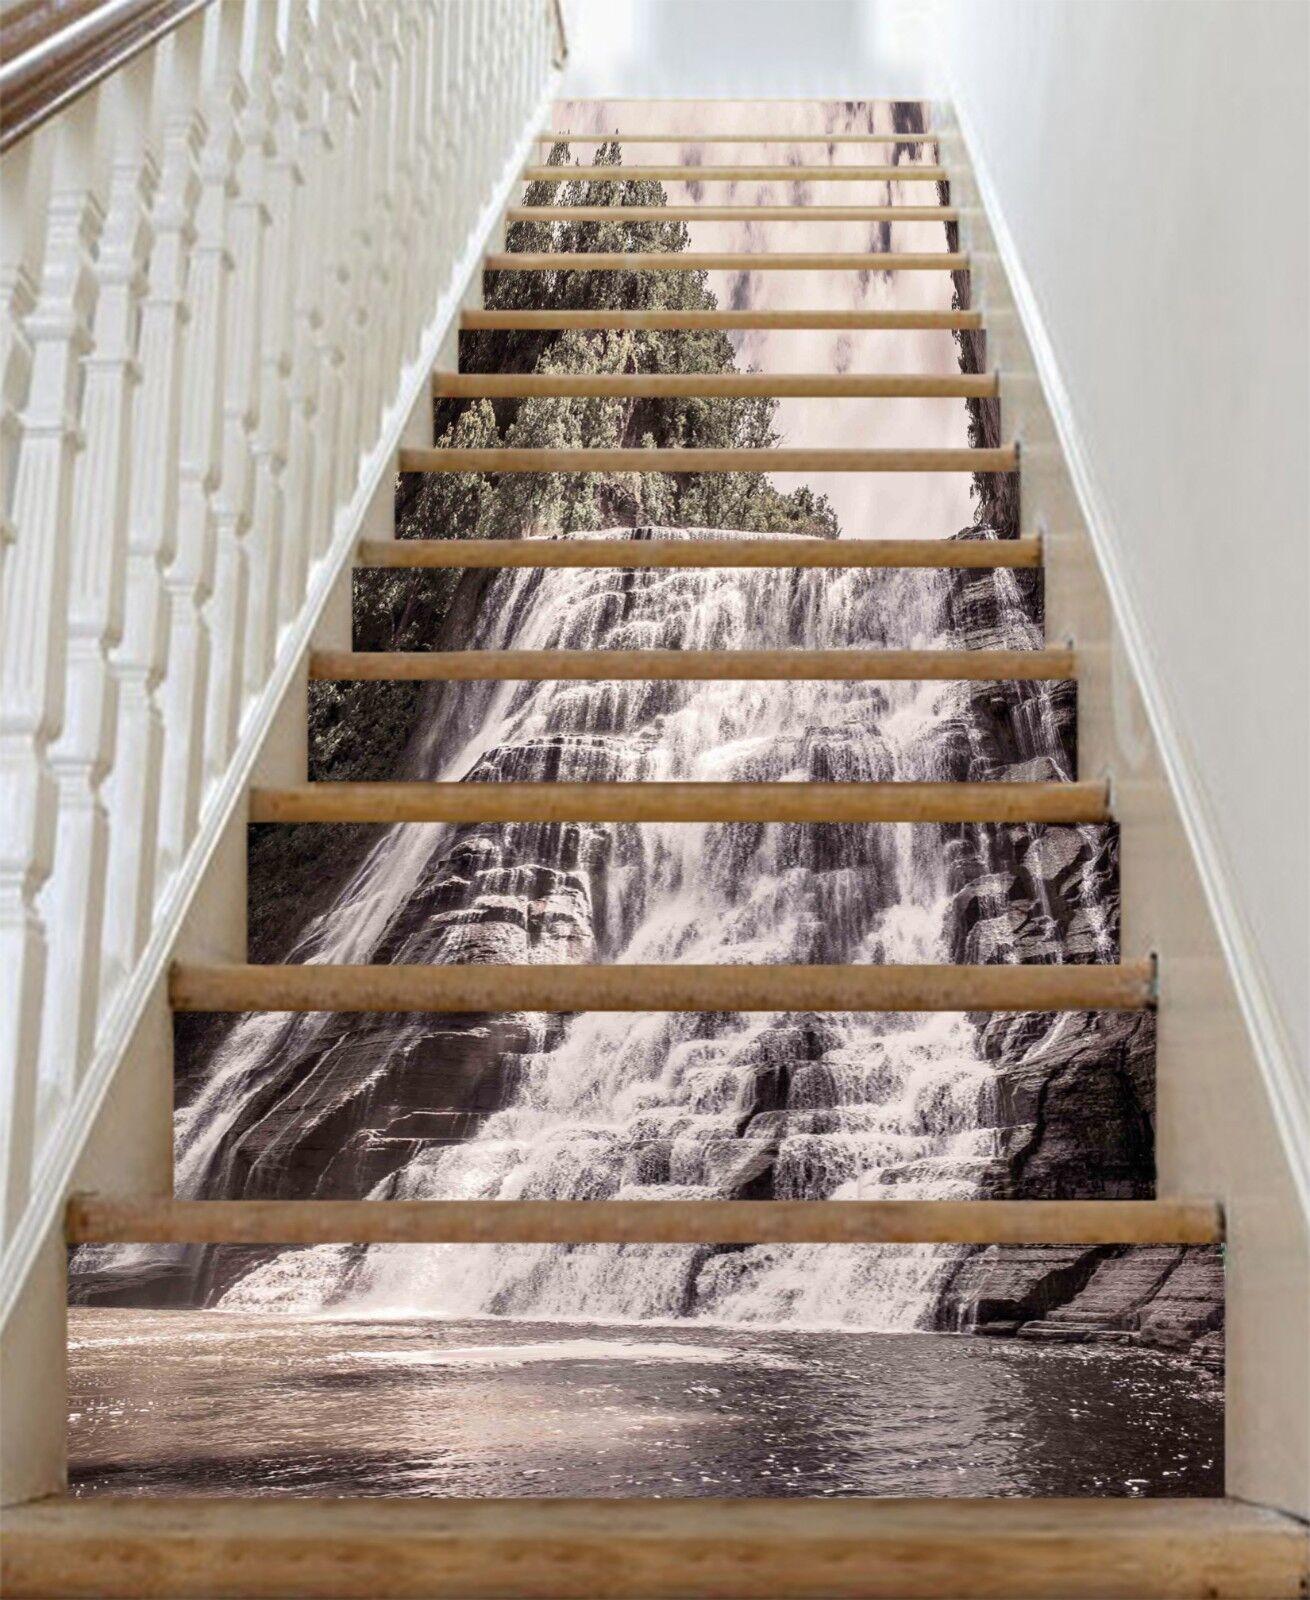 3D Landscape 317 Stair Risers Decoration Photo Mural Vinyl Decal Wallpaper UK